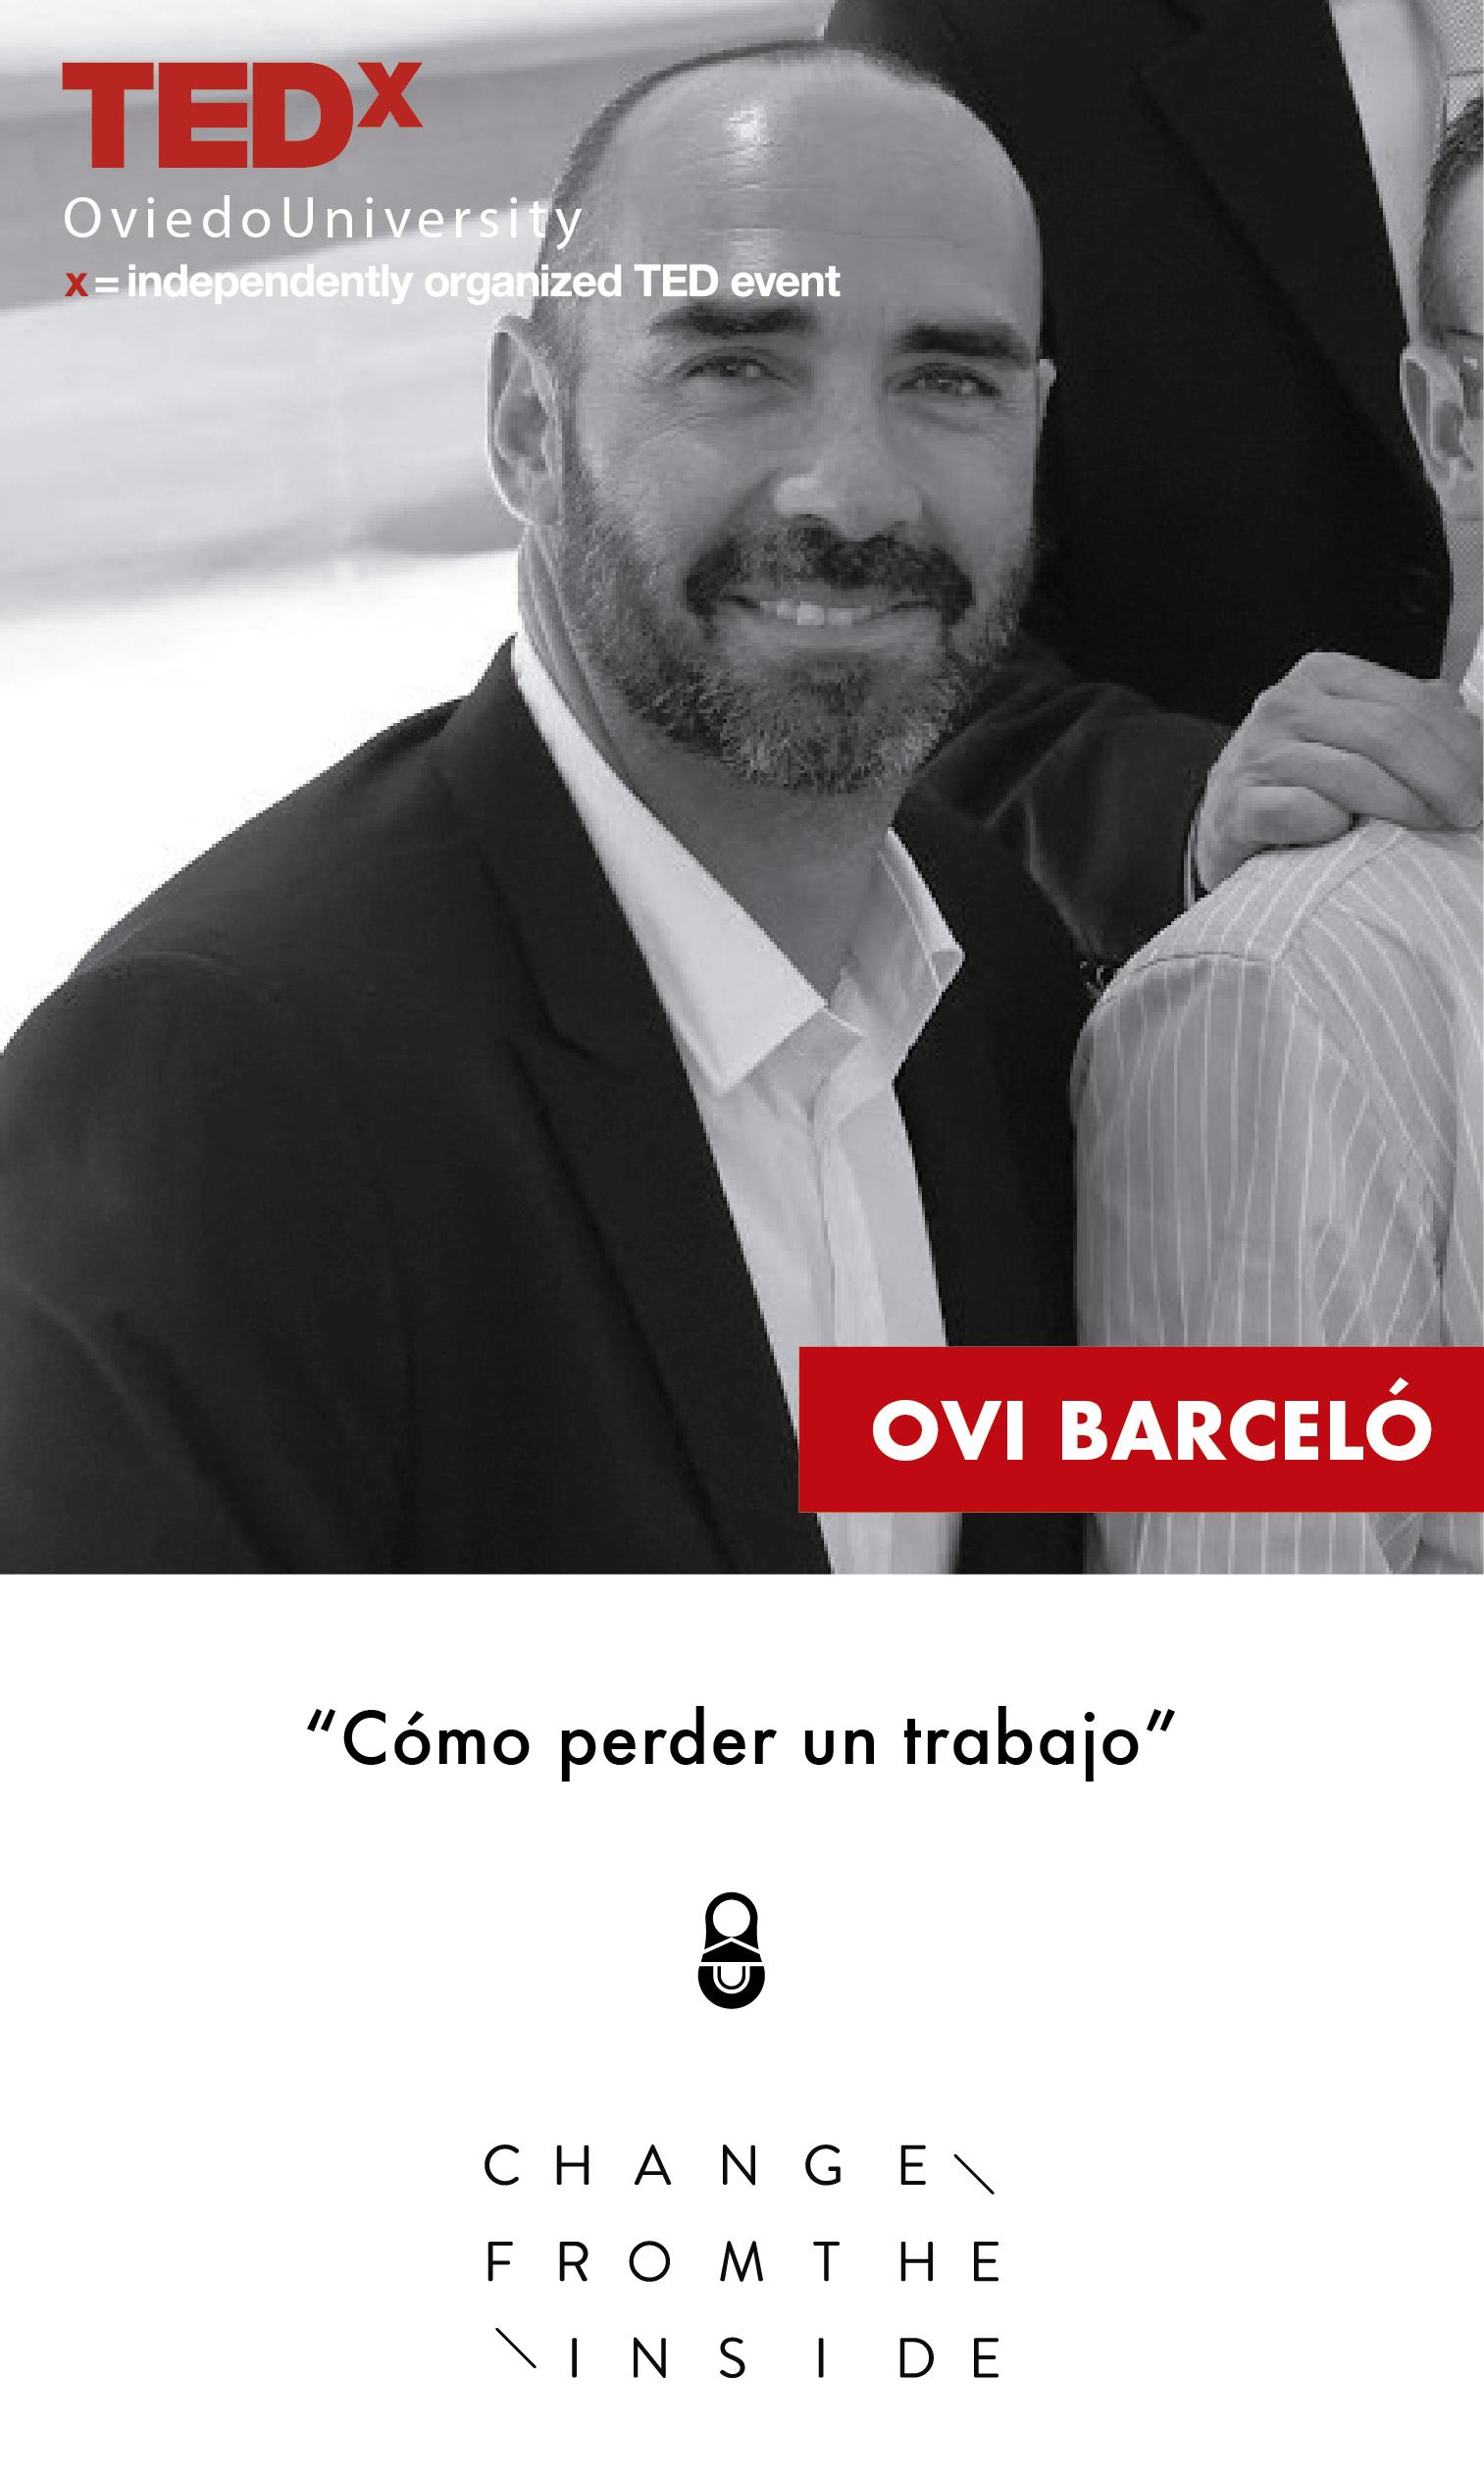 OVI BARCELÓ